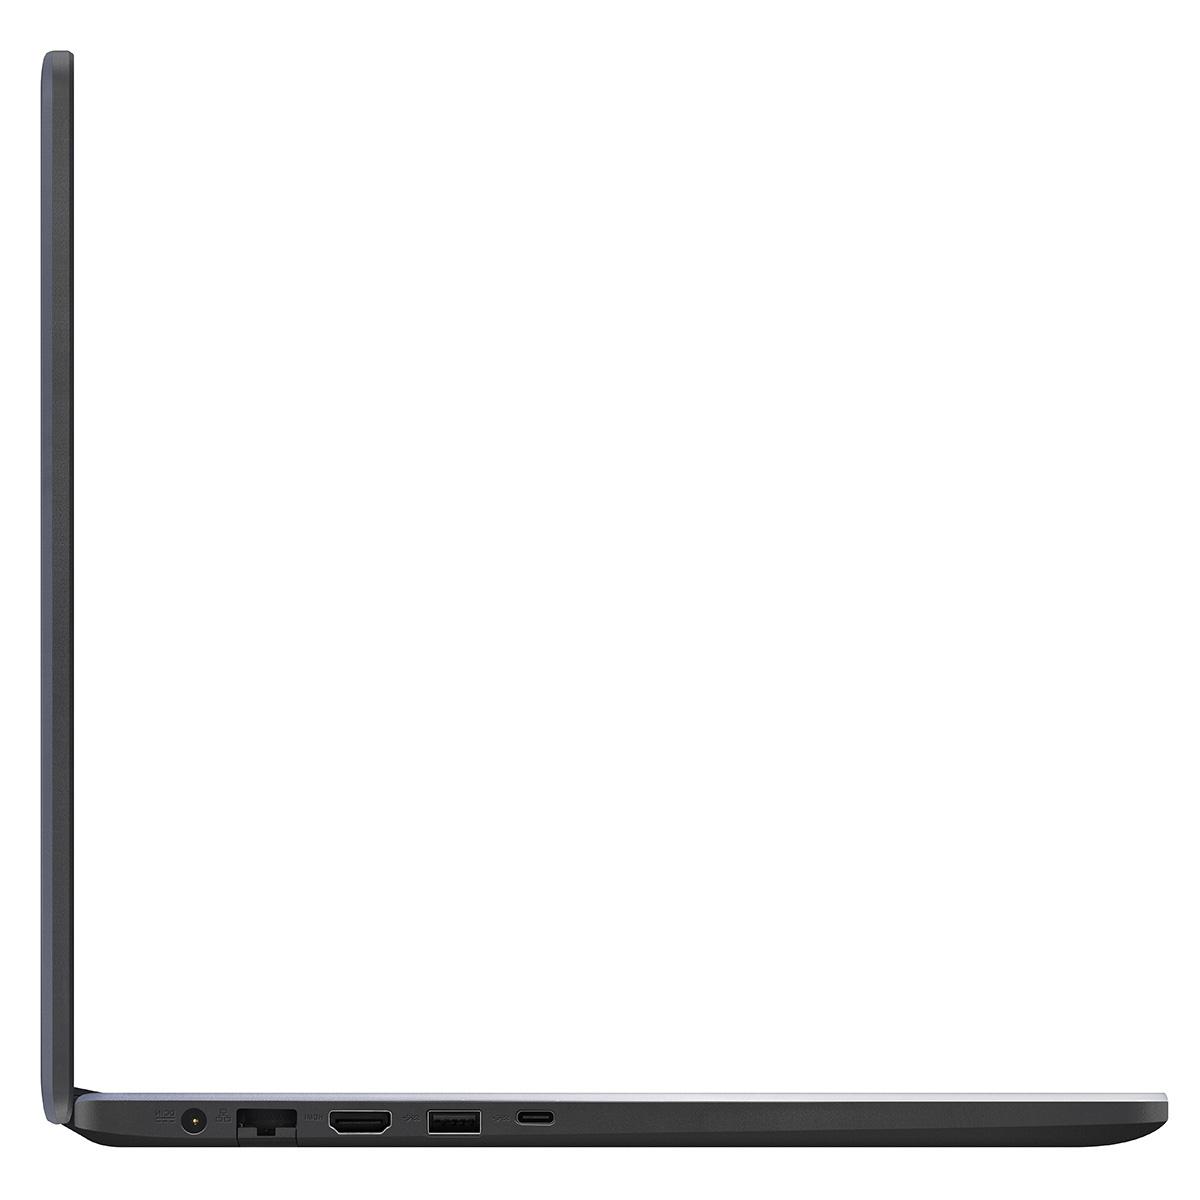 Asus 90NB0IE1-M01500 - PC portable Asus - Cybertek.fr - 5